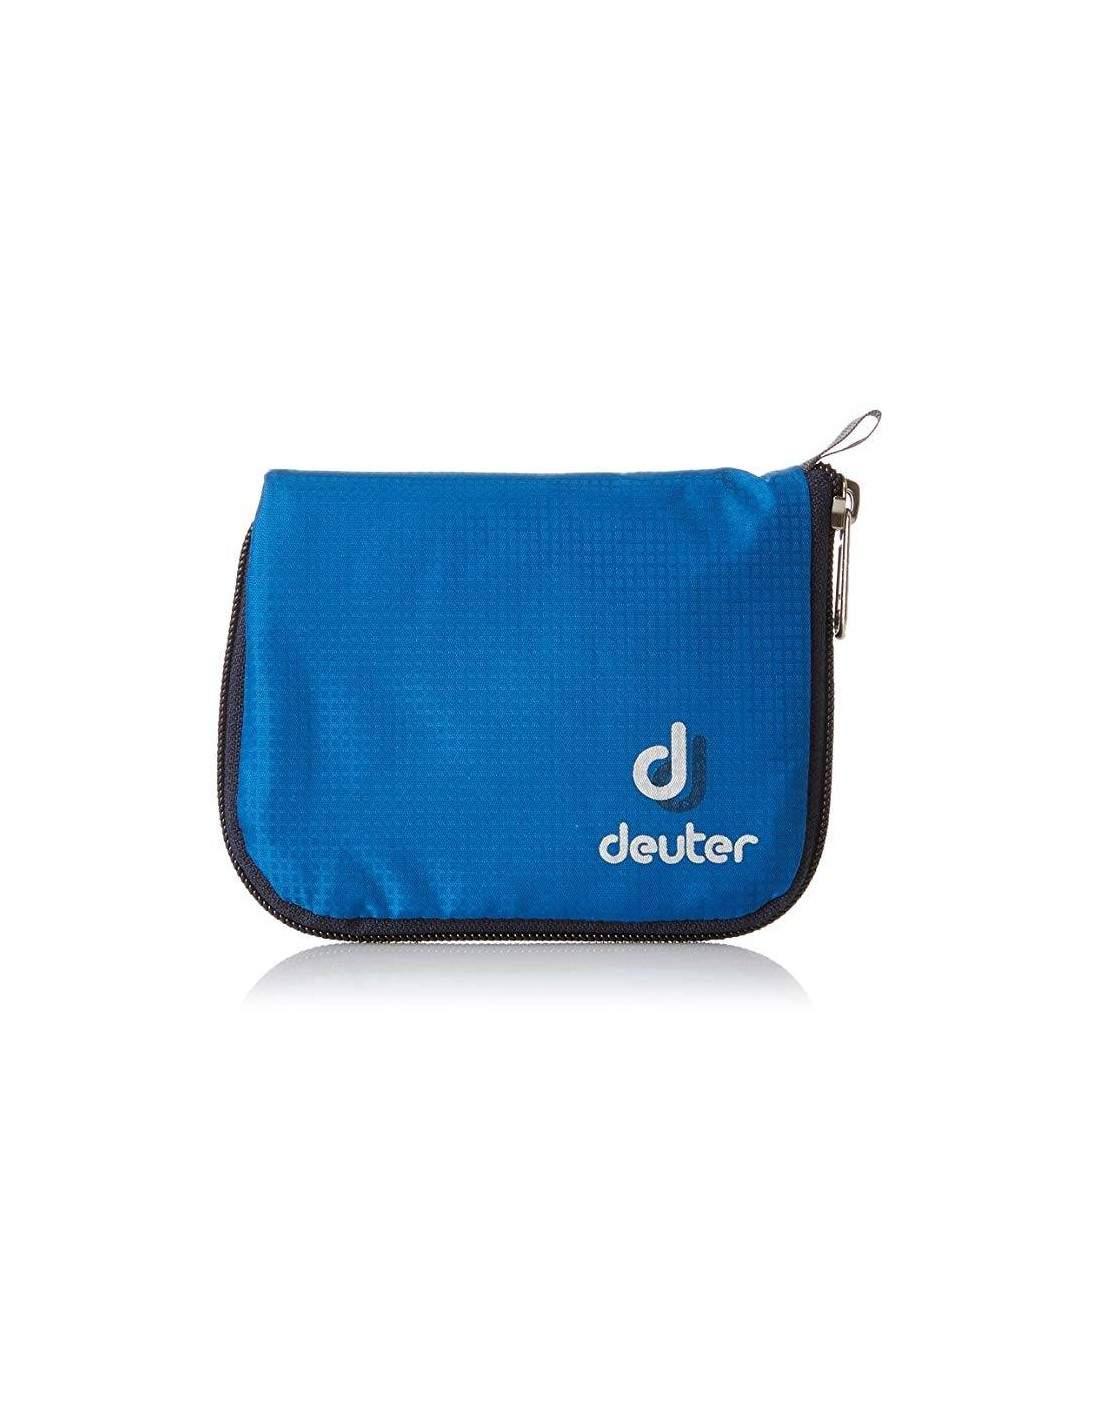 enorme verkoop voortreffelijk ontwerp klassiek Deuter wallet ZIP WALLET BLACK, or BLUE, Fashion and sport ...